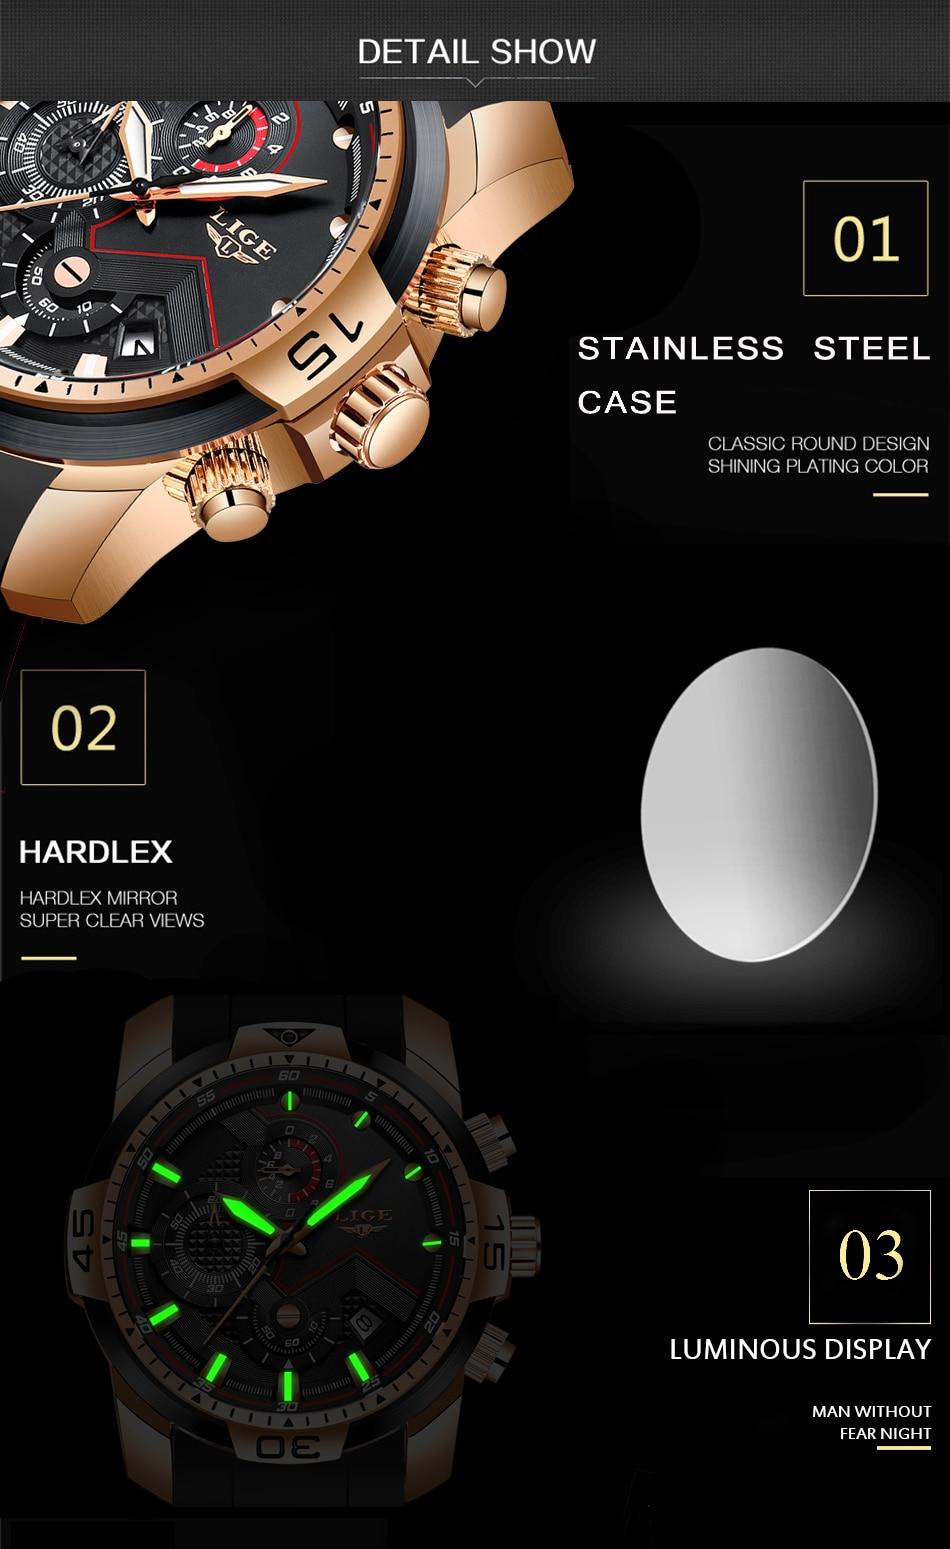 H9f51bfdd00b2495c9aeb73f0355834e7I 2020 LIGE Sport Watch Men Brand Luxury Chronograph Silicone Strap Quartz Mens Watches Waterproof Clock Relogio Masculino+Box